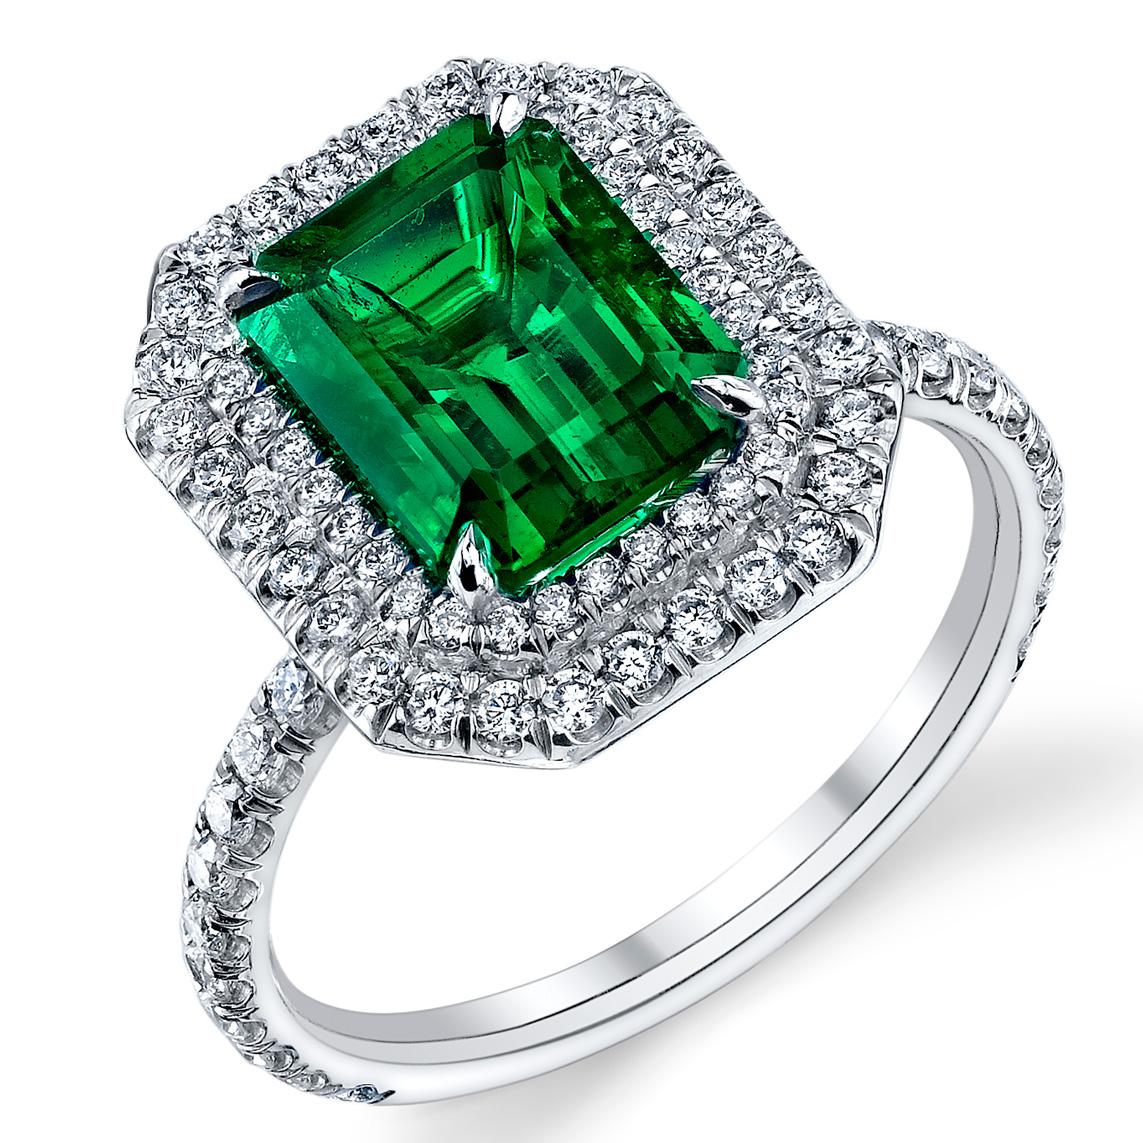 Engagement Rings Manhattan Beach